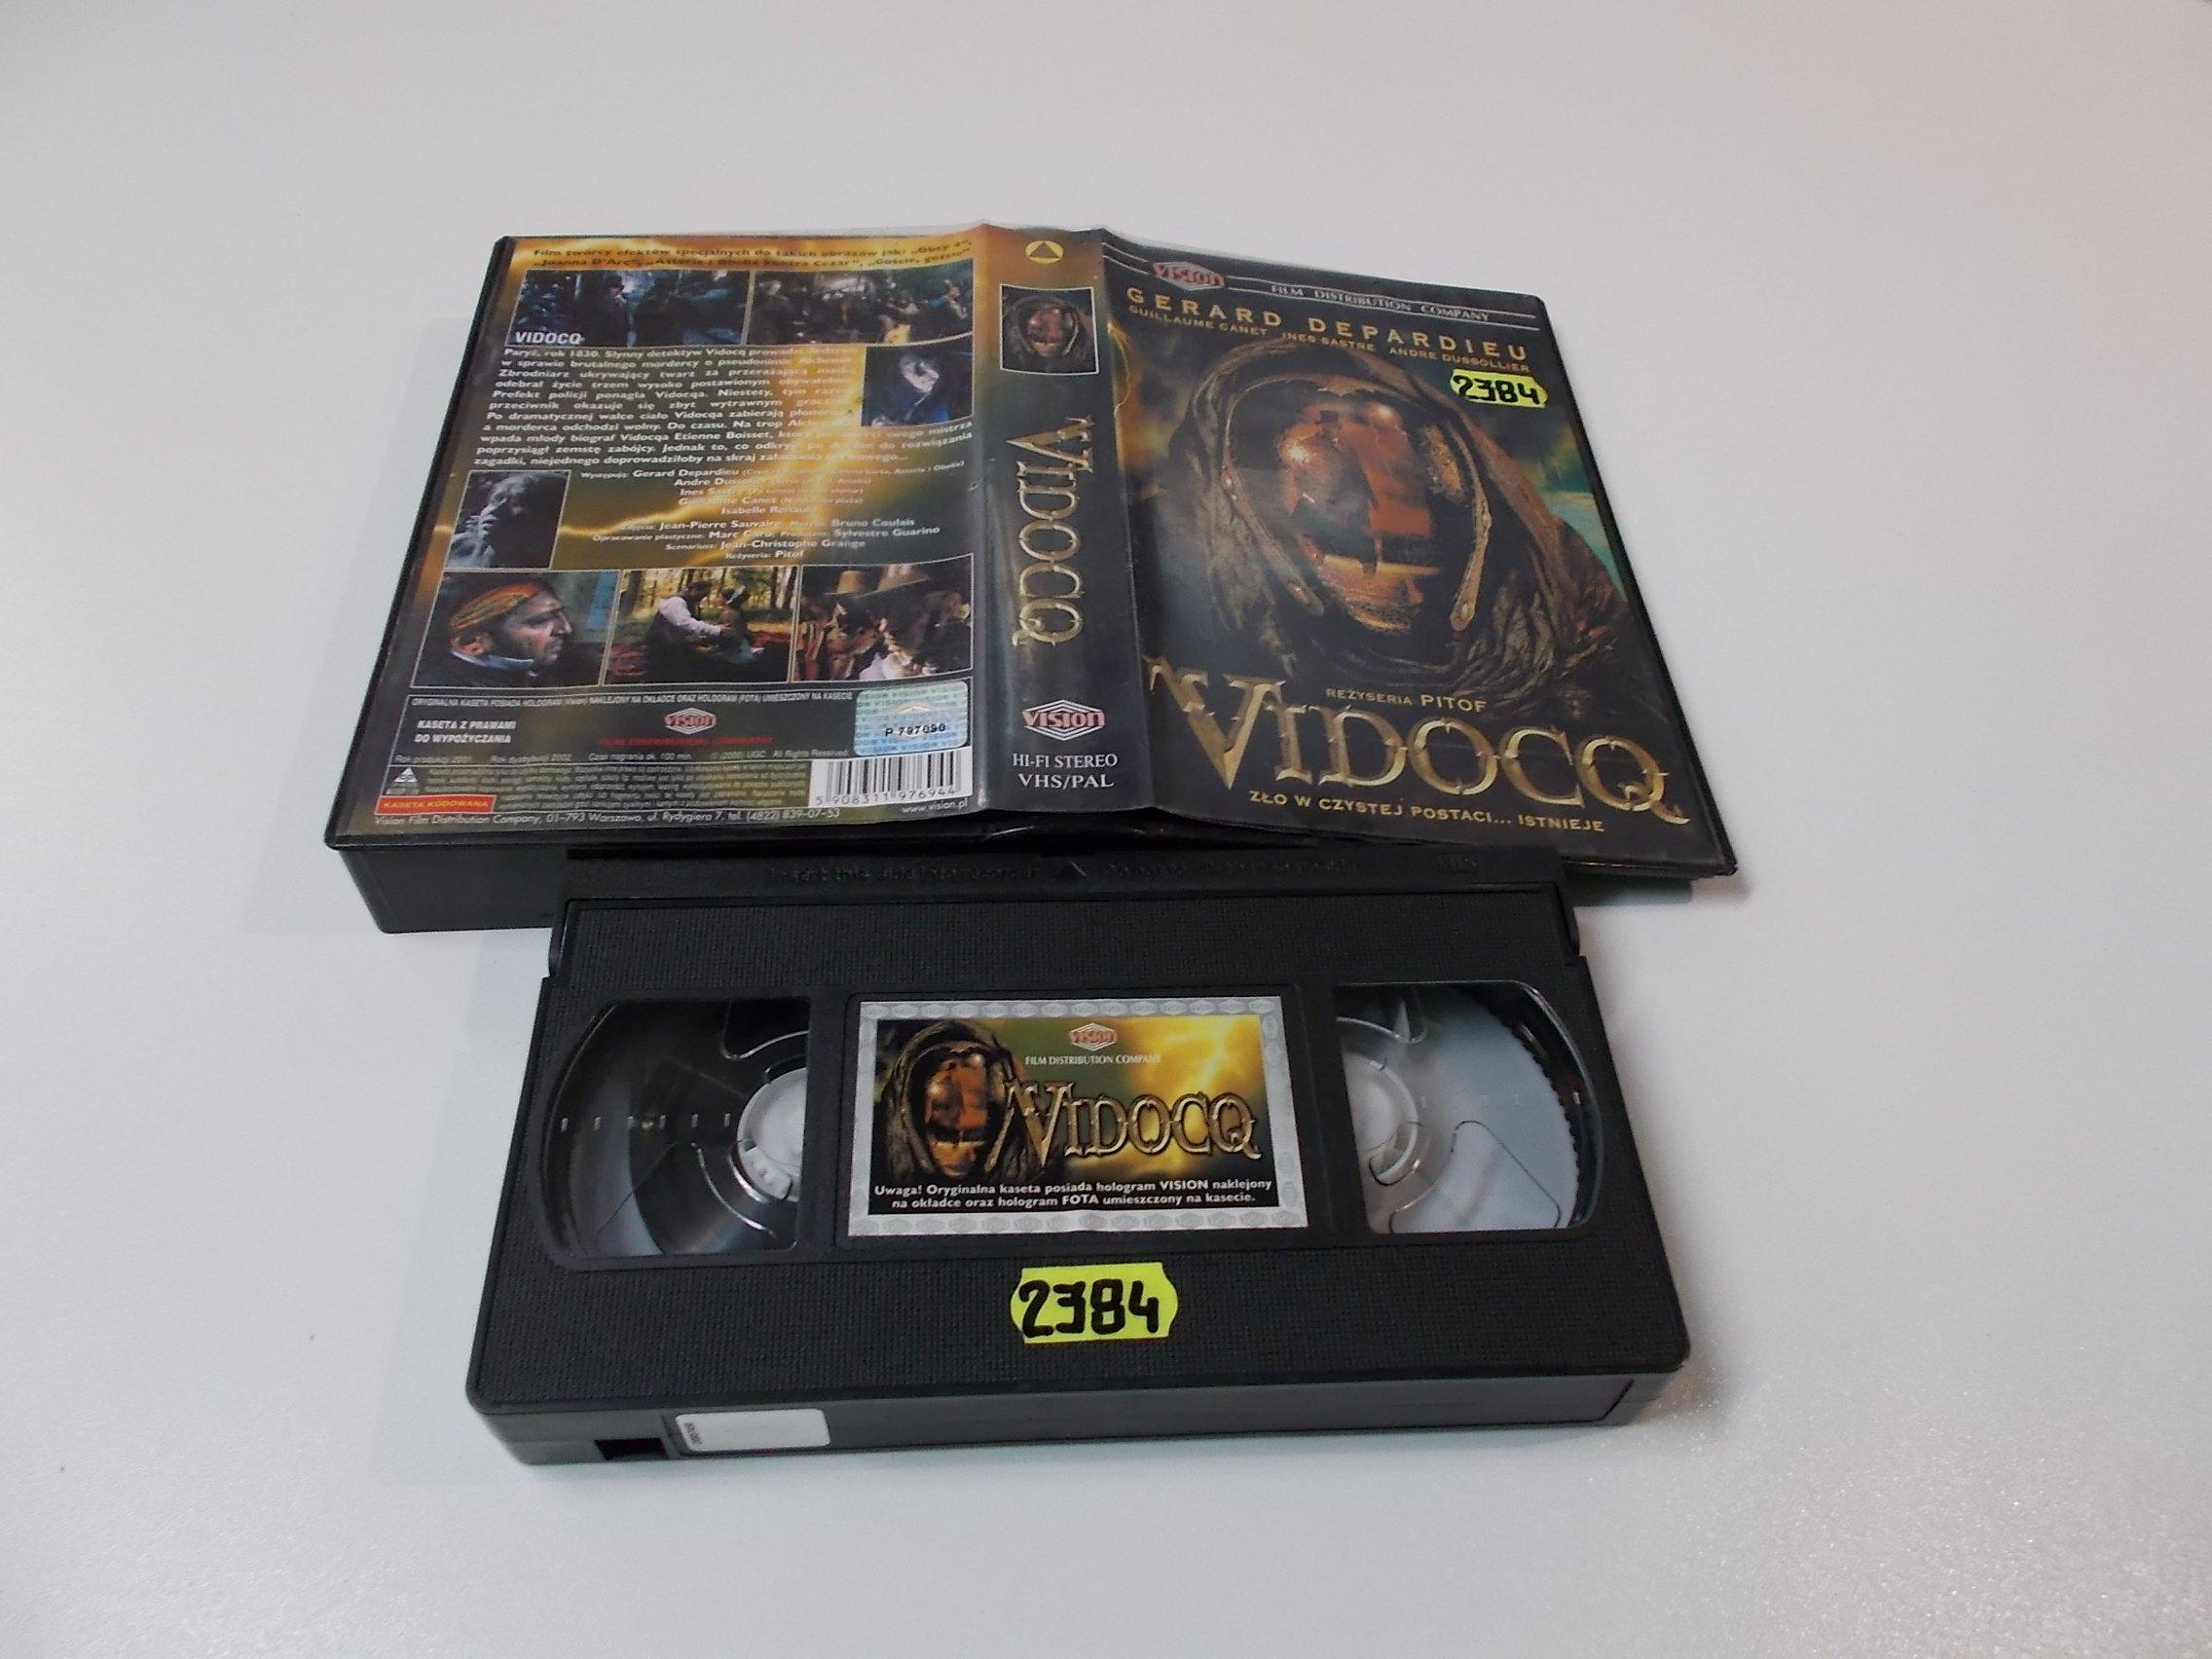 VIDOCQ - GERARD DEPARDIEU - VHS Kaseta Video - Opole 1606